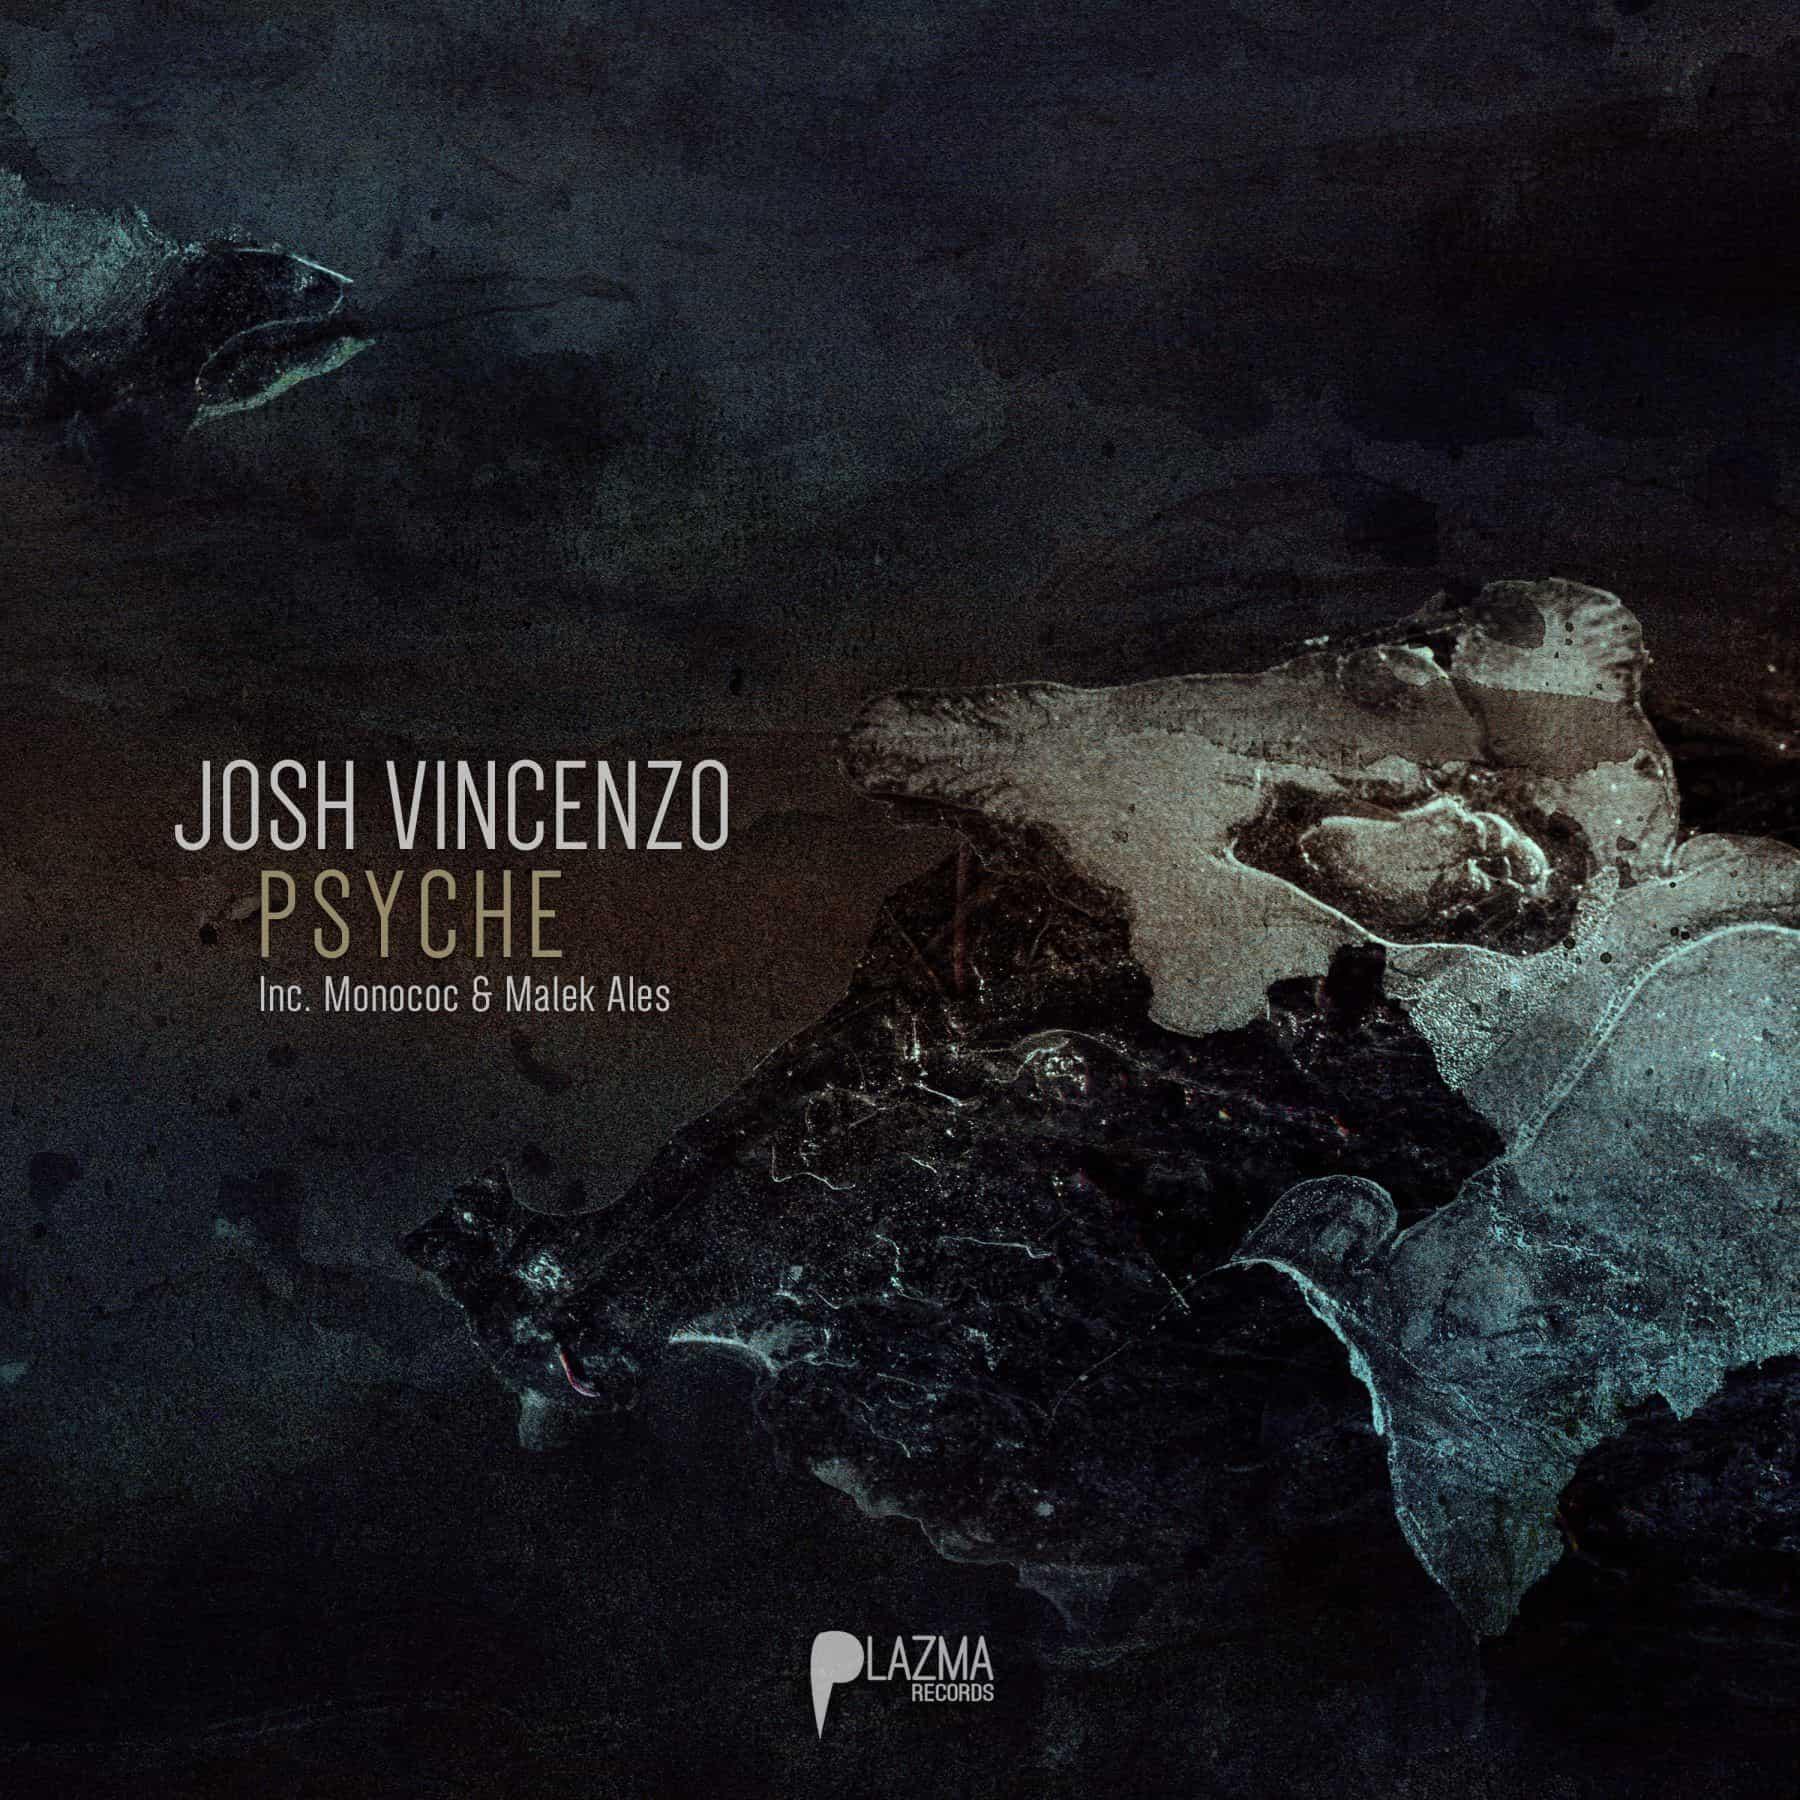 Josh Vincenzo - Psyche EP (Inc. Monococ & Malek Ales)